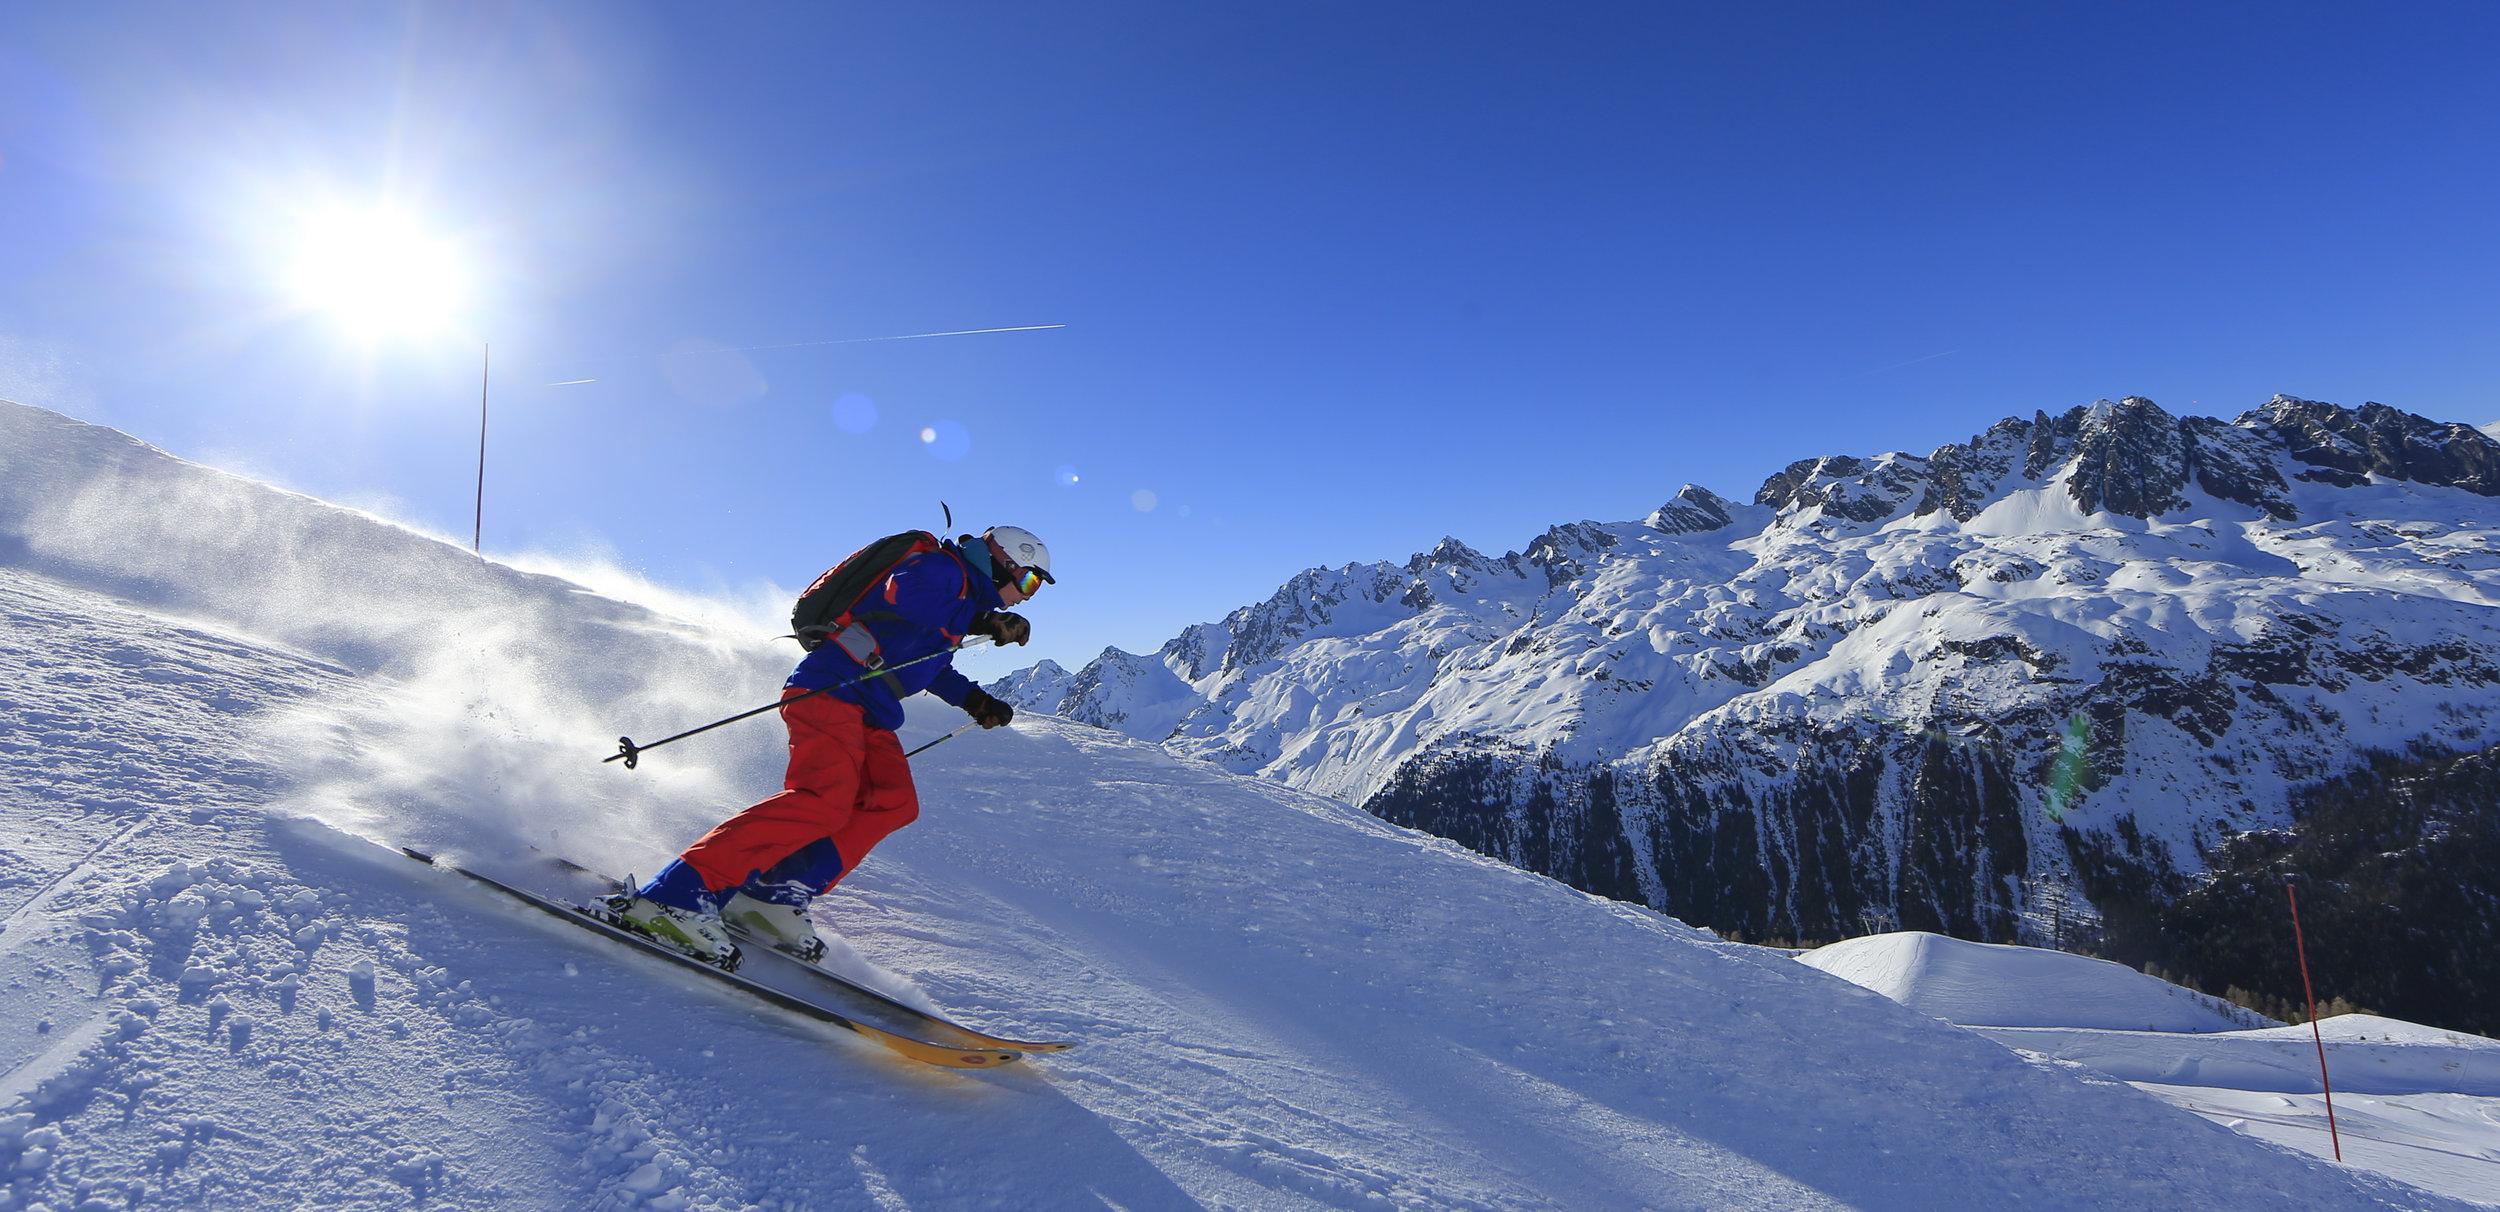 Astute Aviation   Private Jet Charter   Ski Slopes   Private Jet Hire   Alps